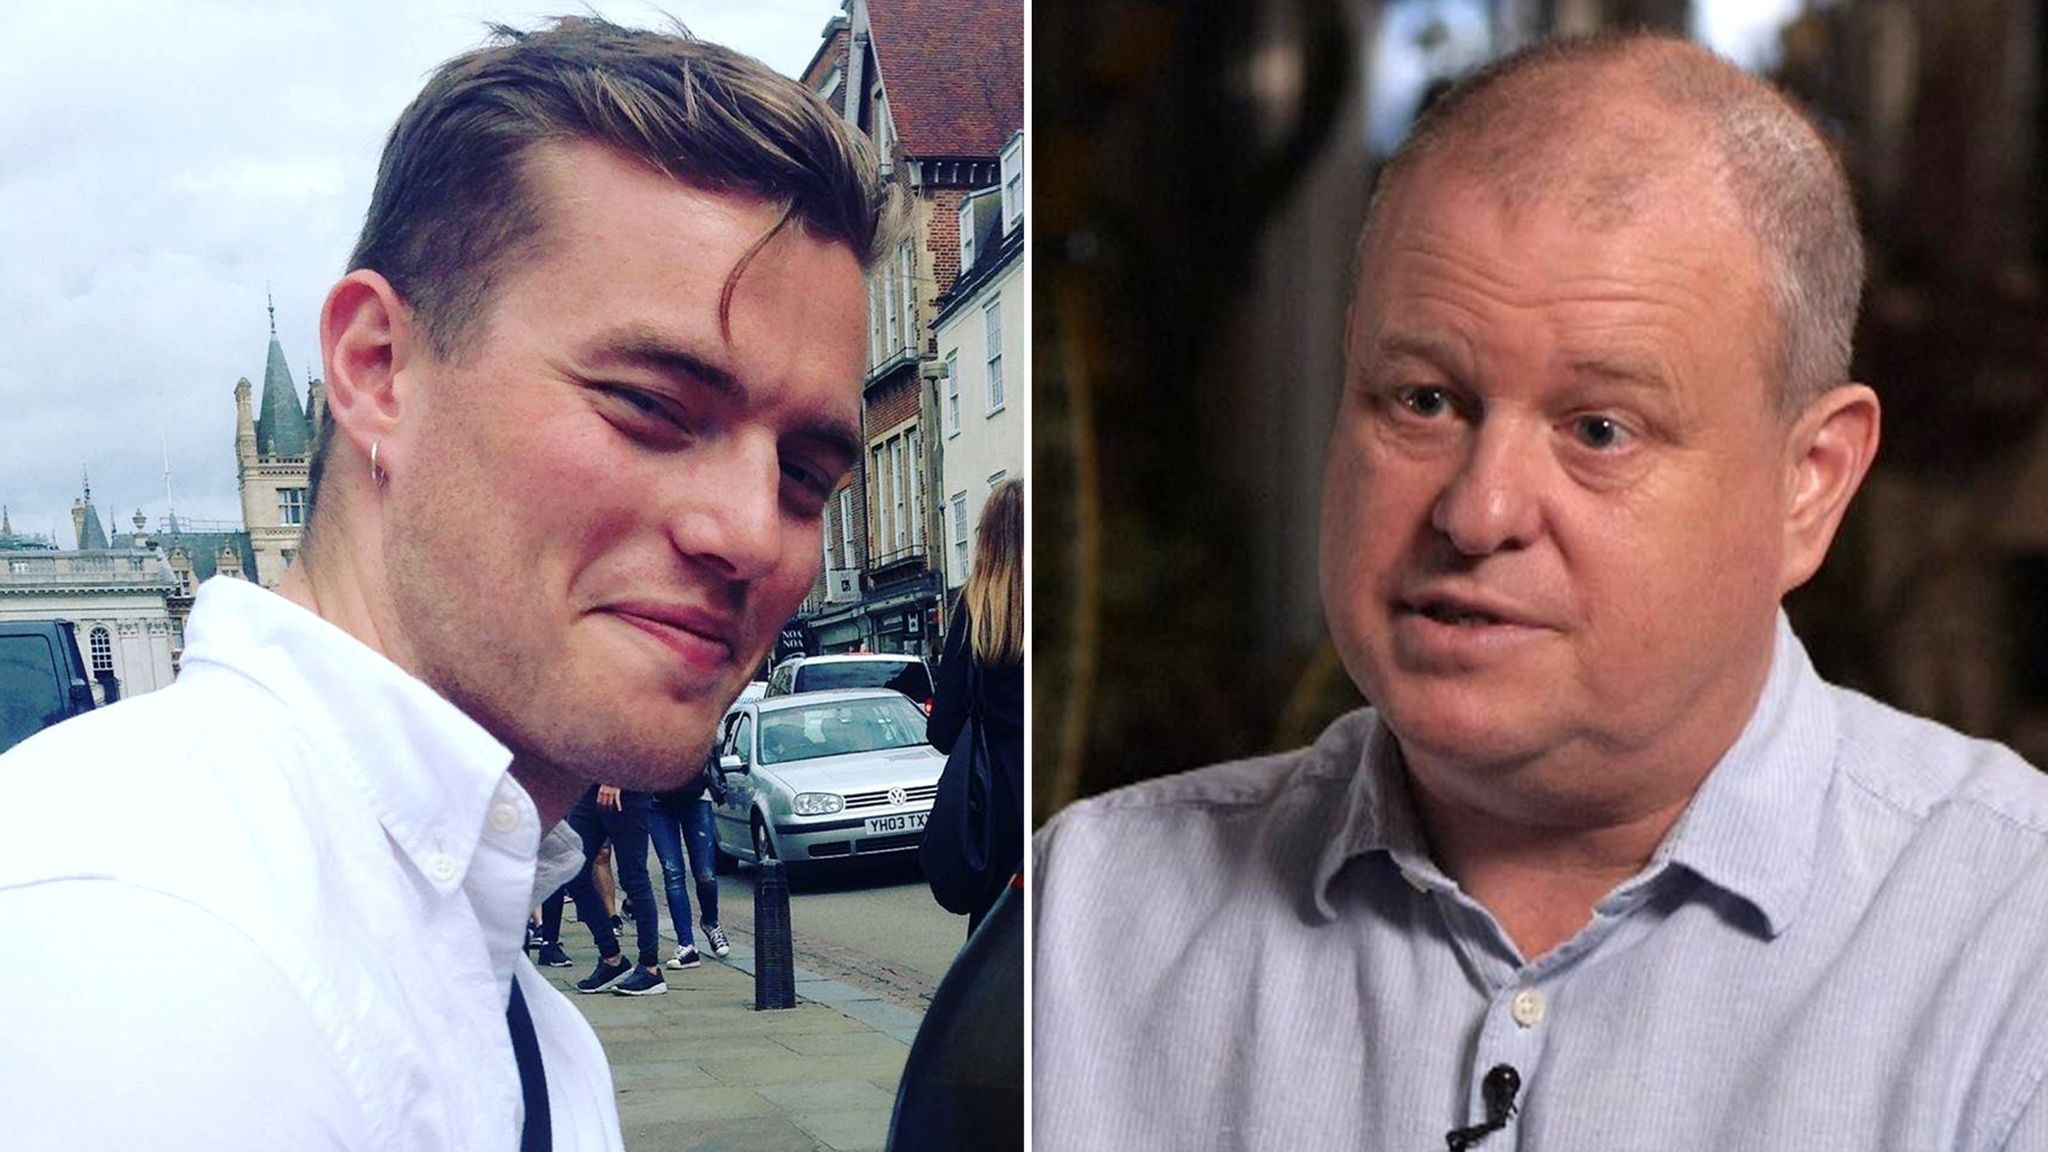 London Bridge attack: Victim Jack Merritt's father accuses Boris Johnson of trying to 'score election points'